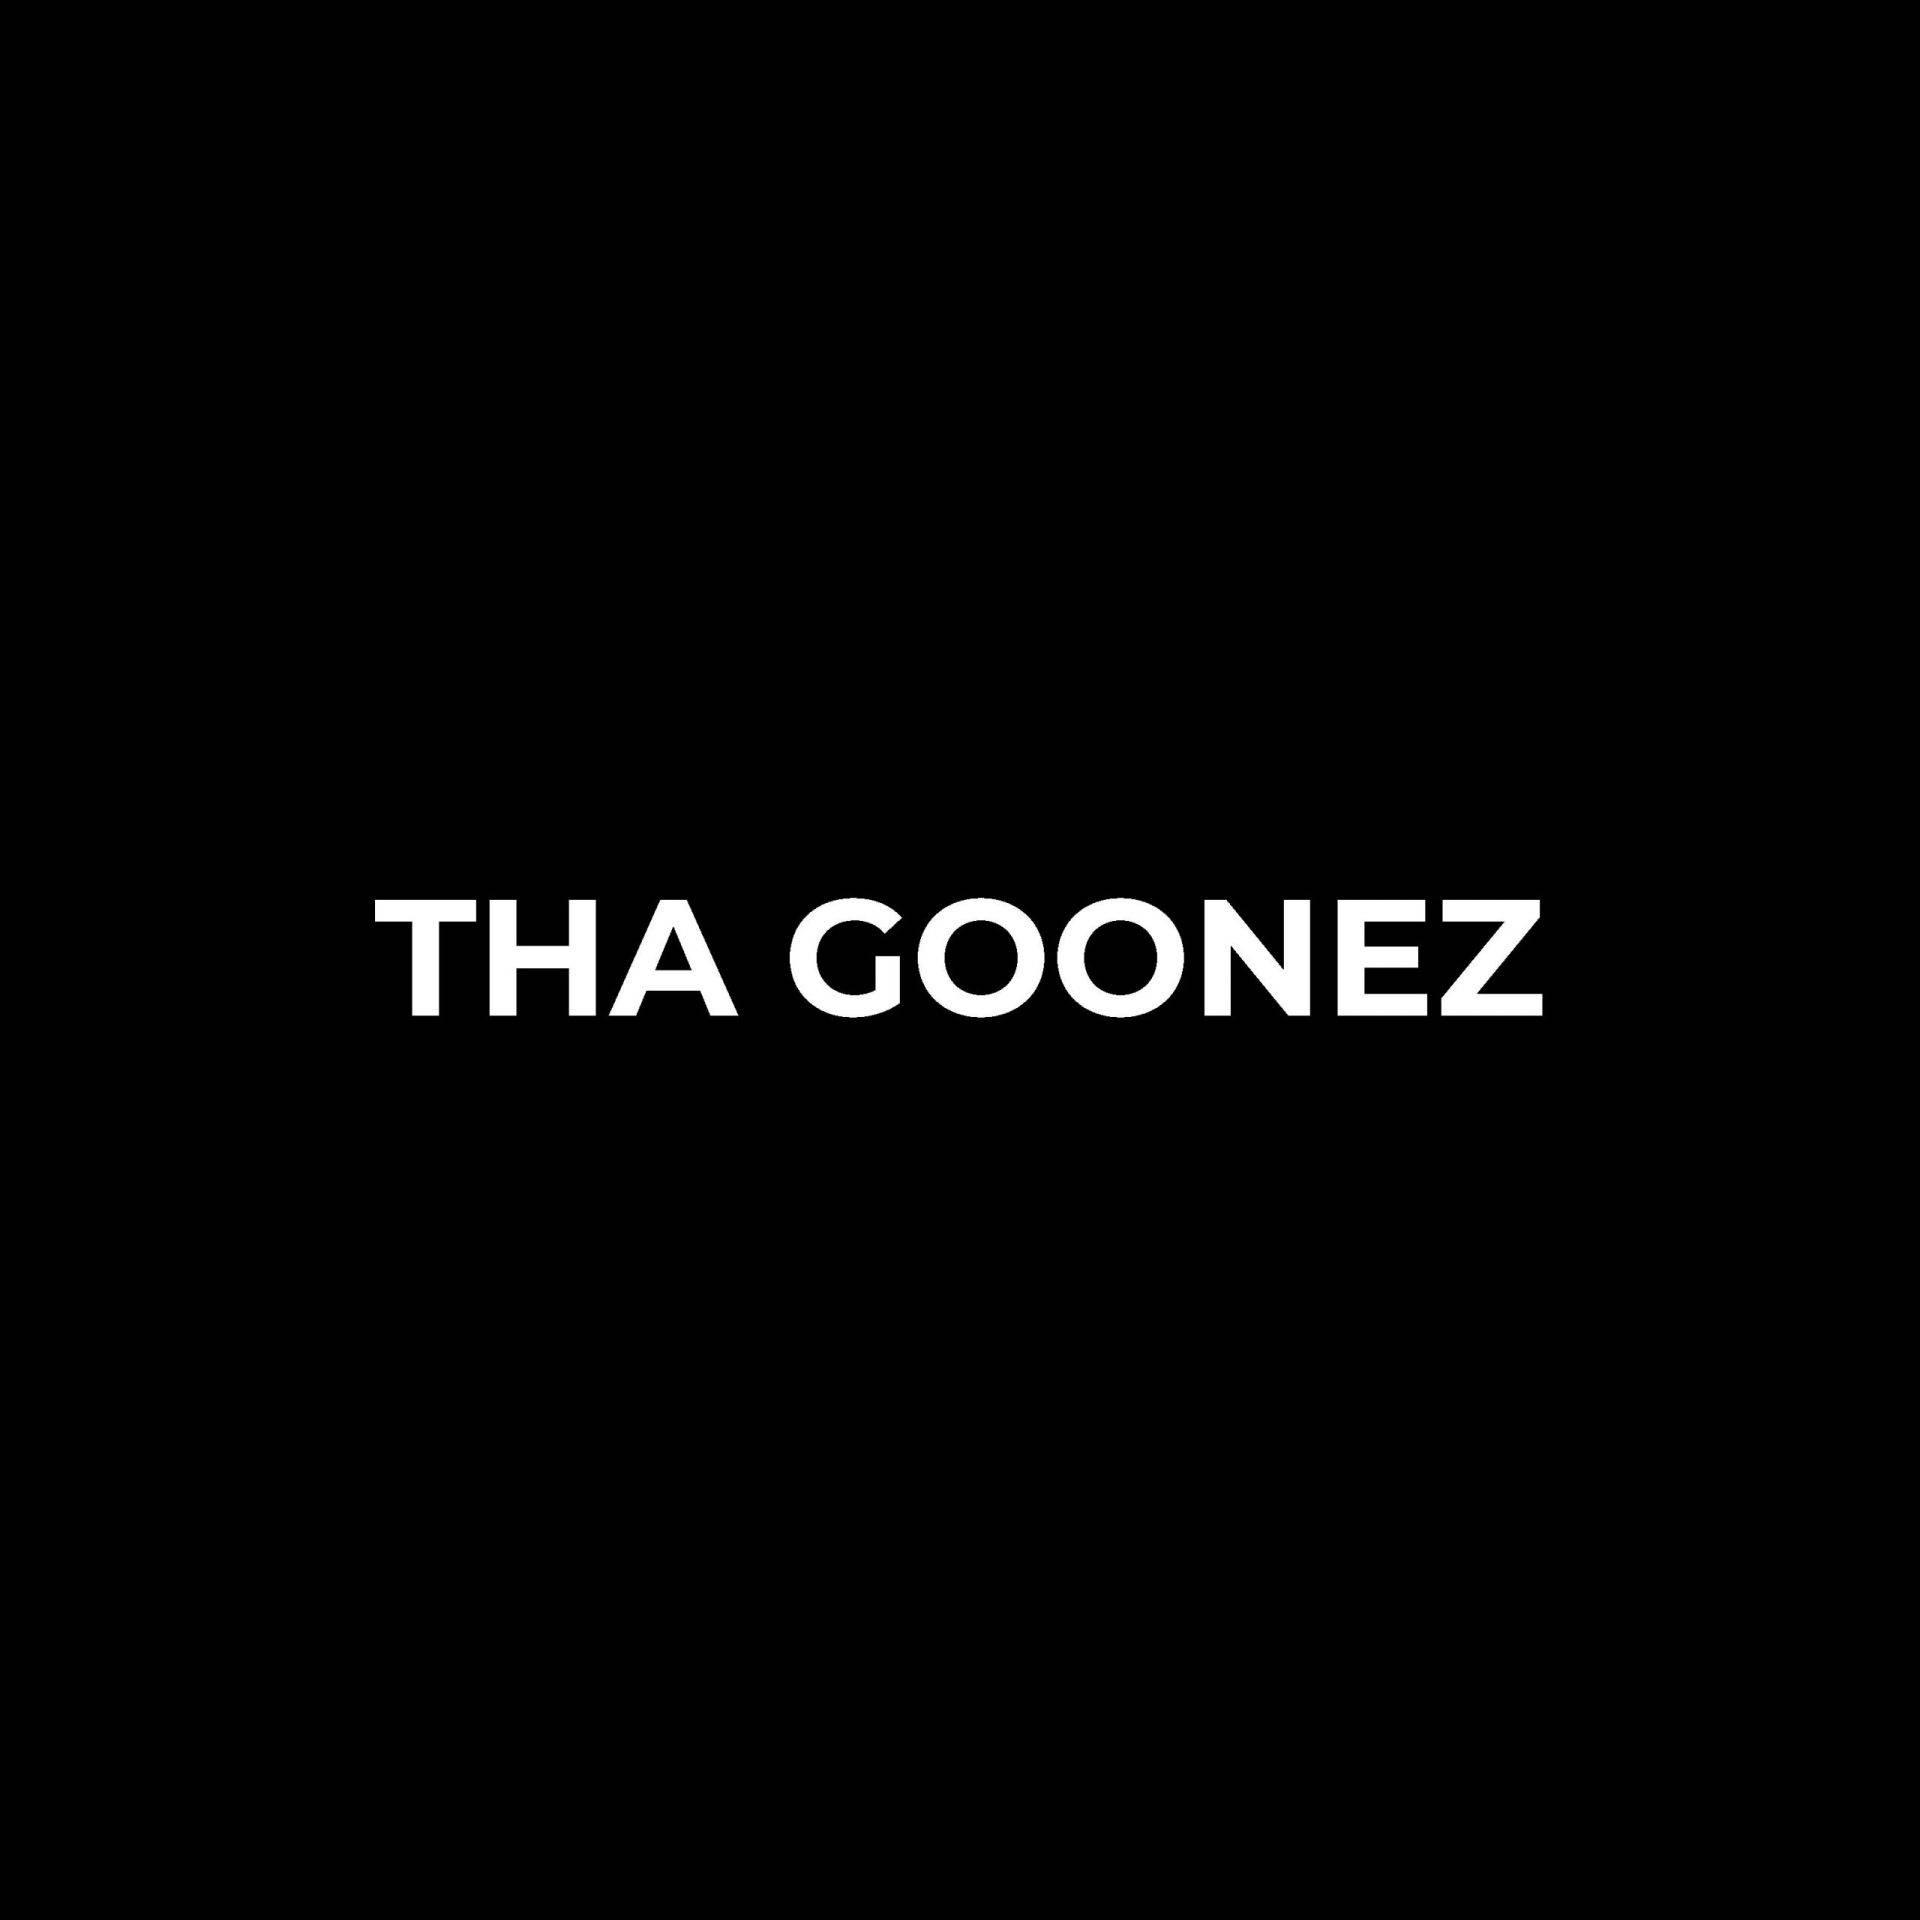 tha goonez producer group